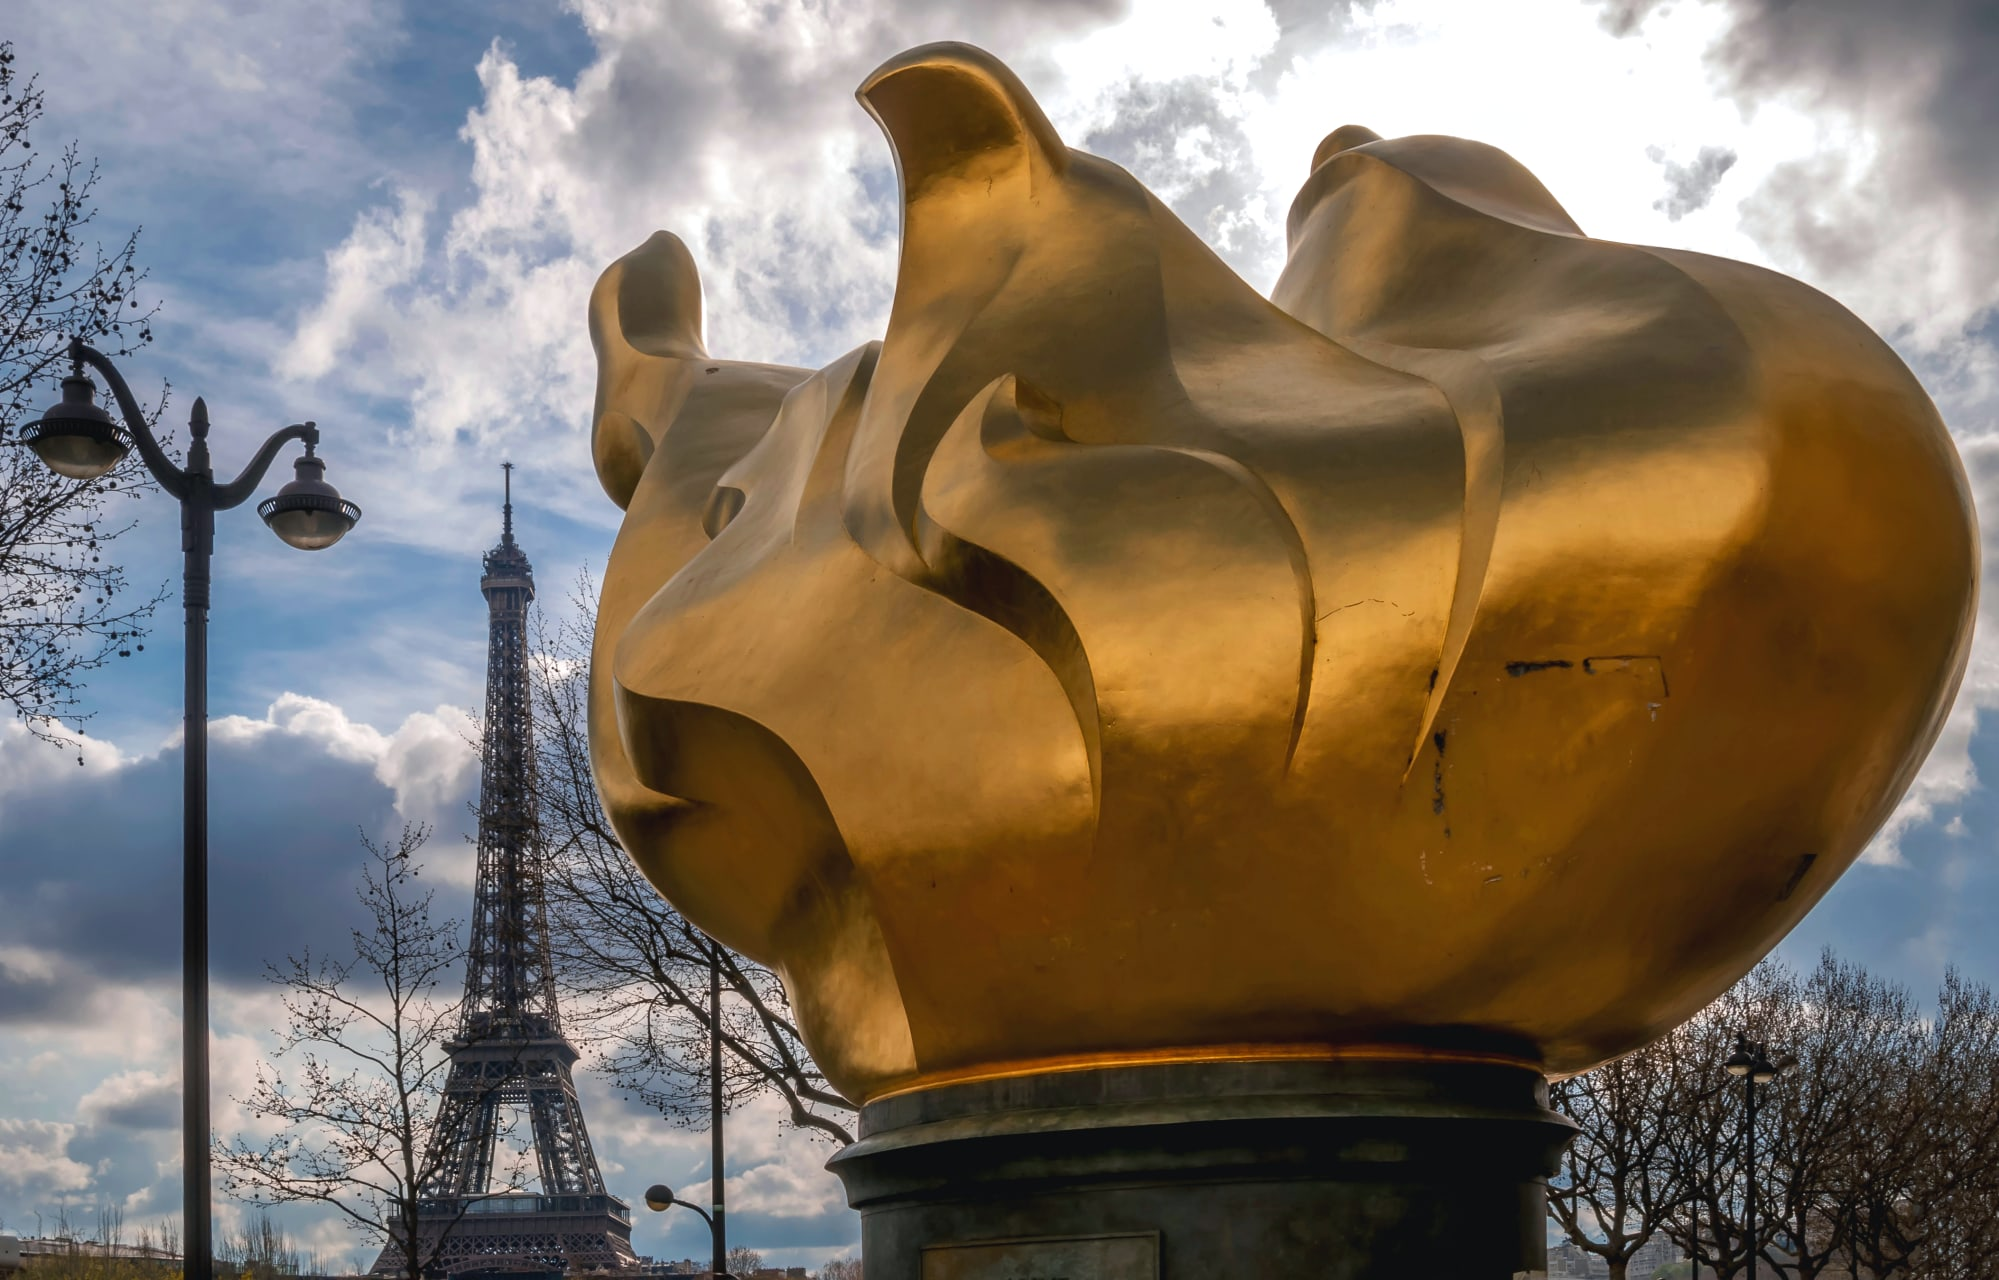 Paris - Commemorate the 20th Anniversary of 9/11